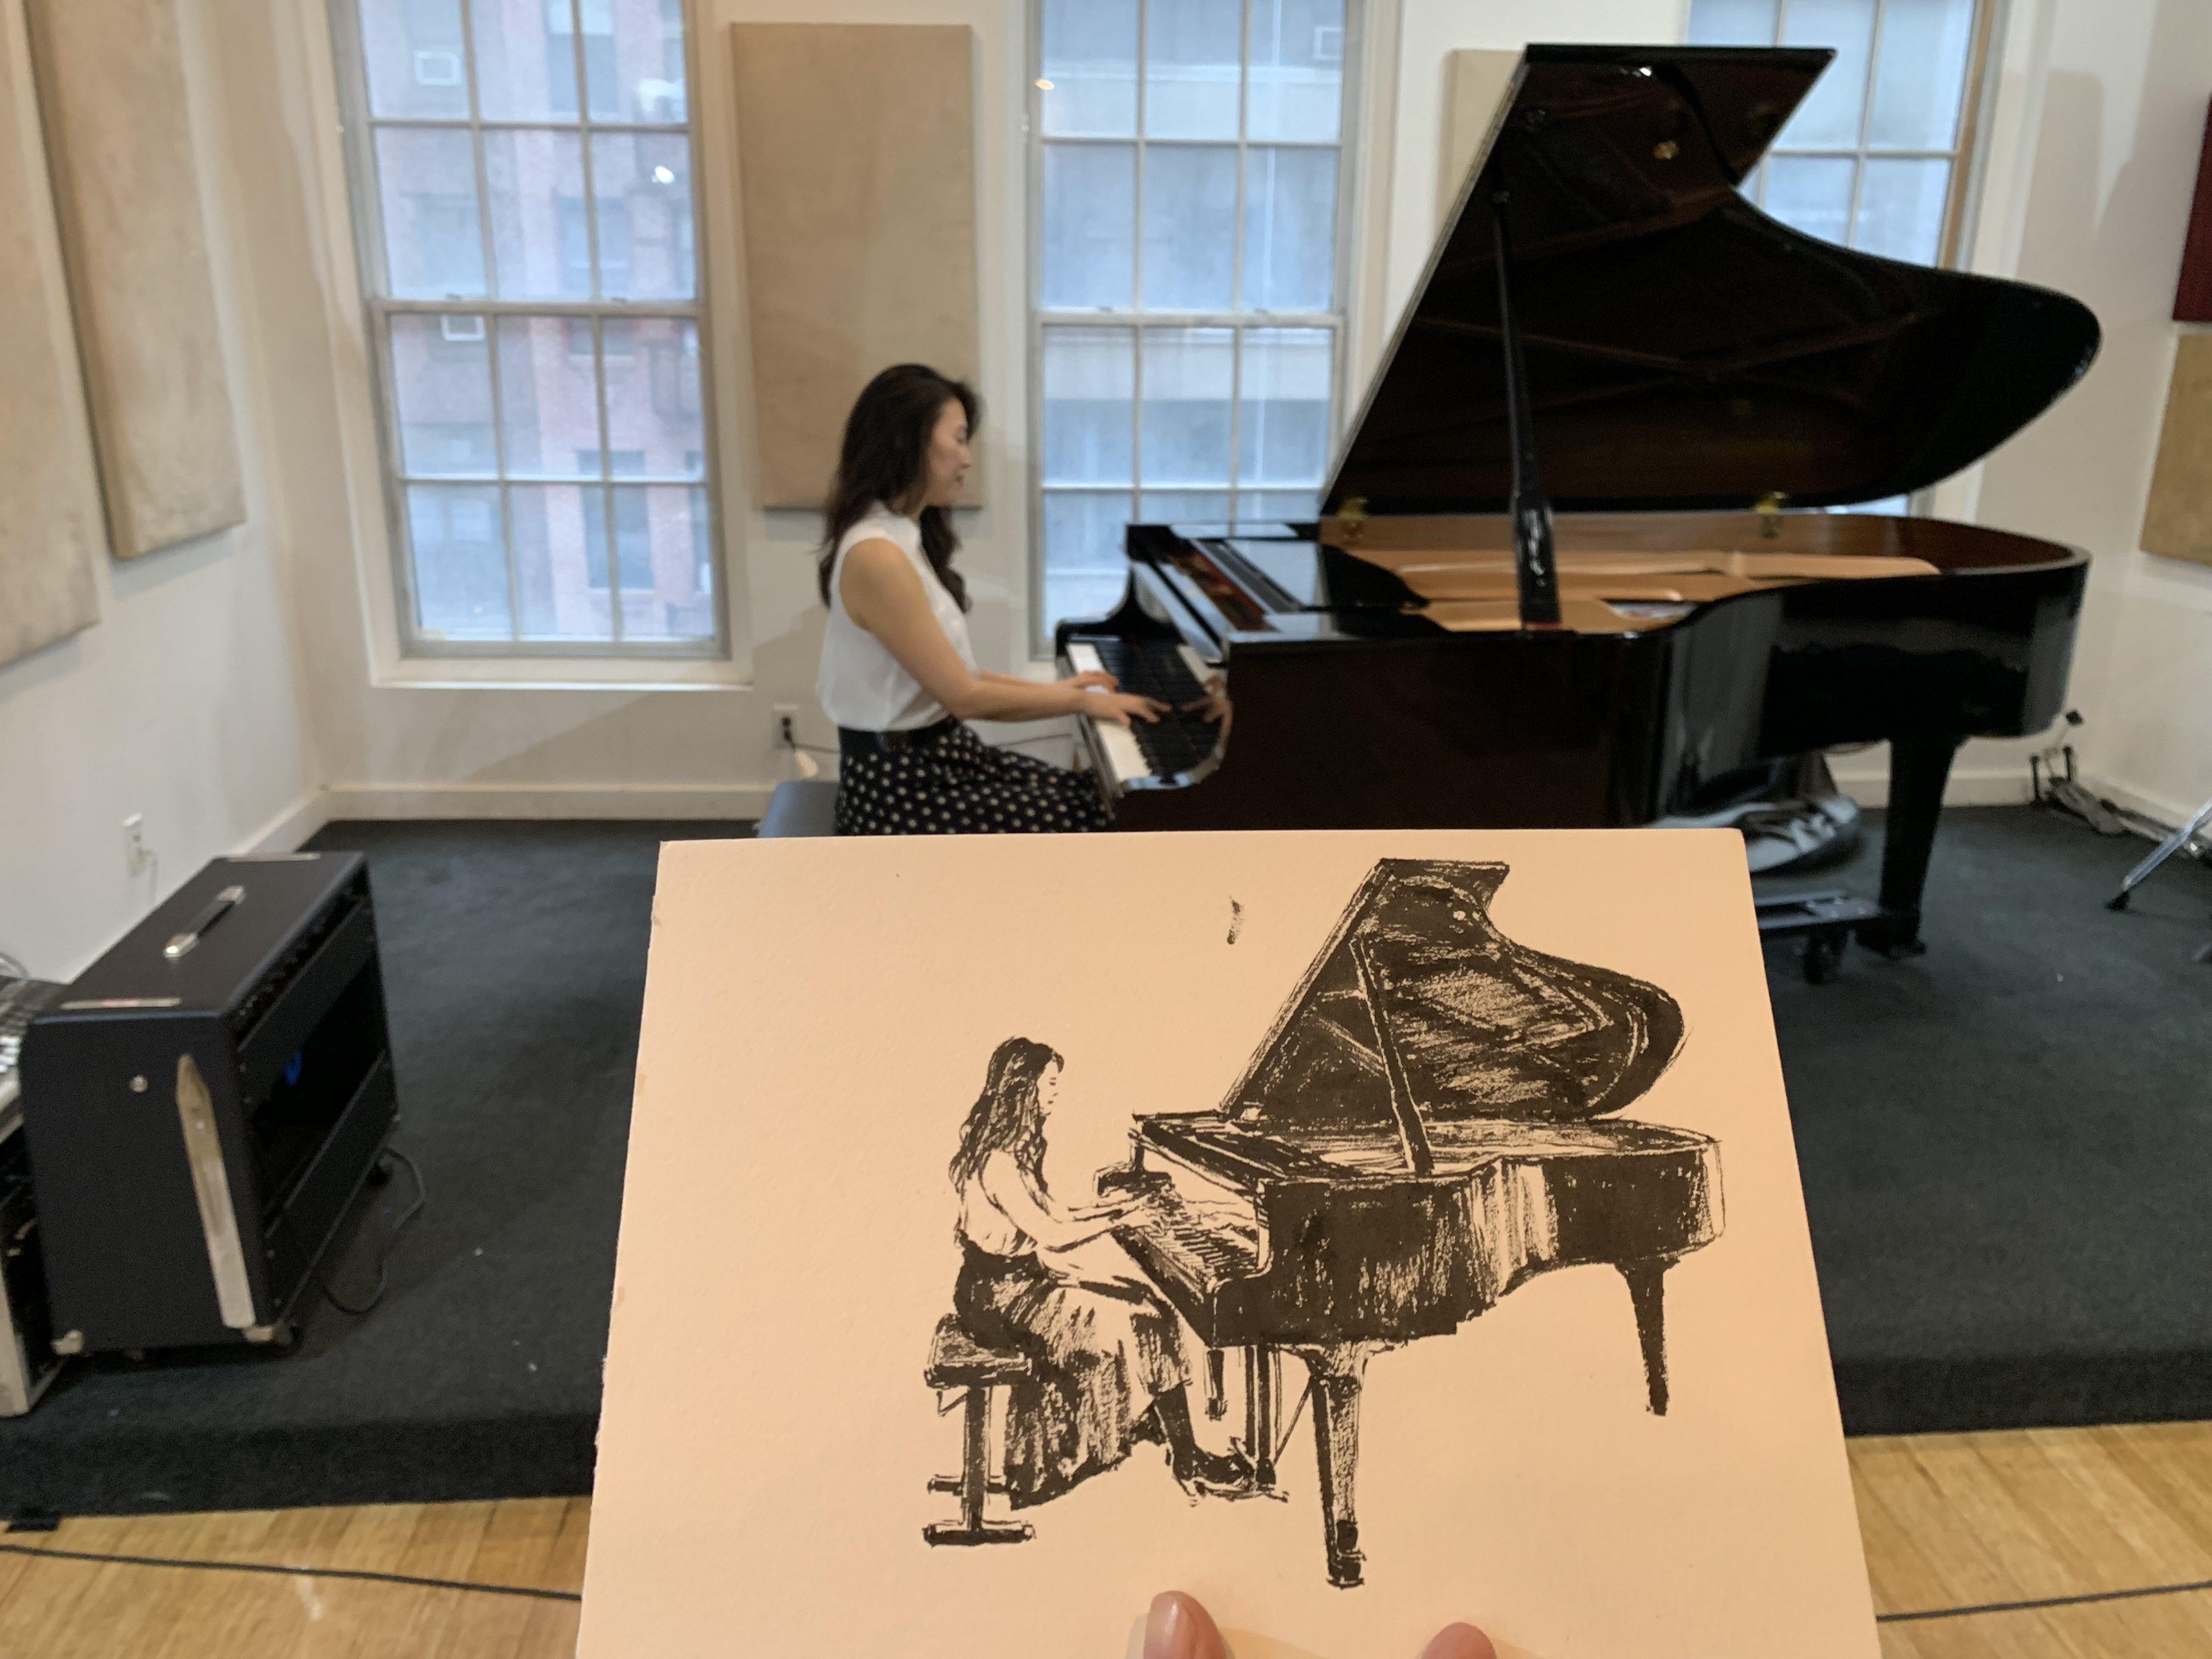 Moonsub Shin illustrates to Jeeyon Kim's piano solos.